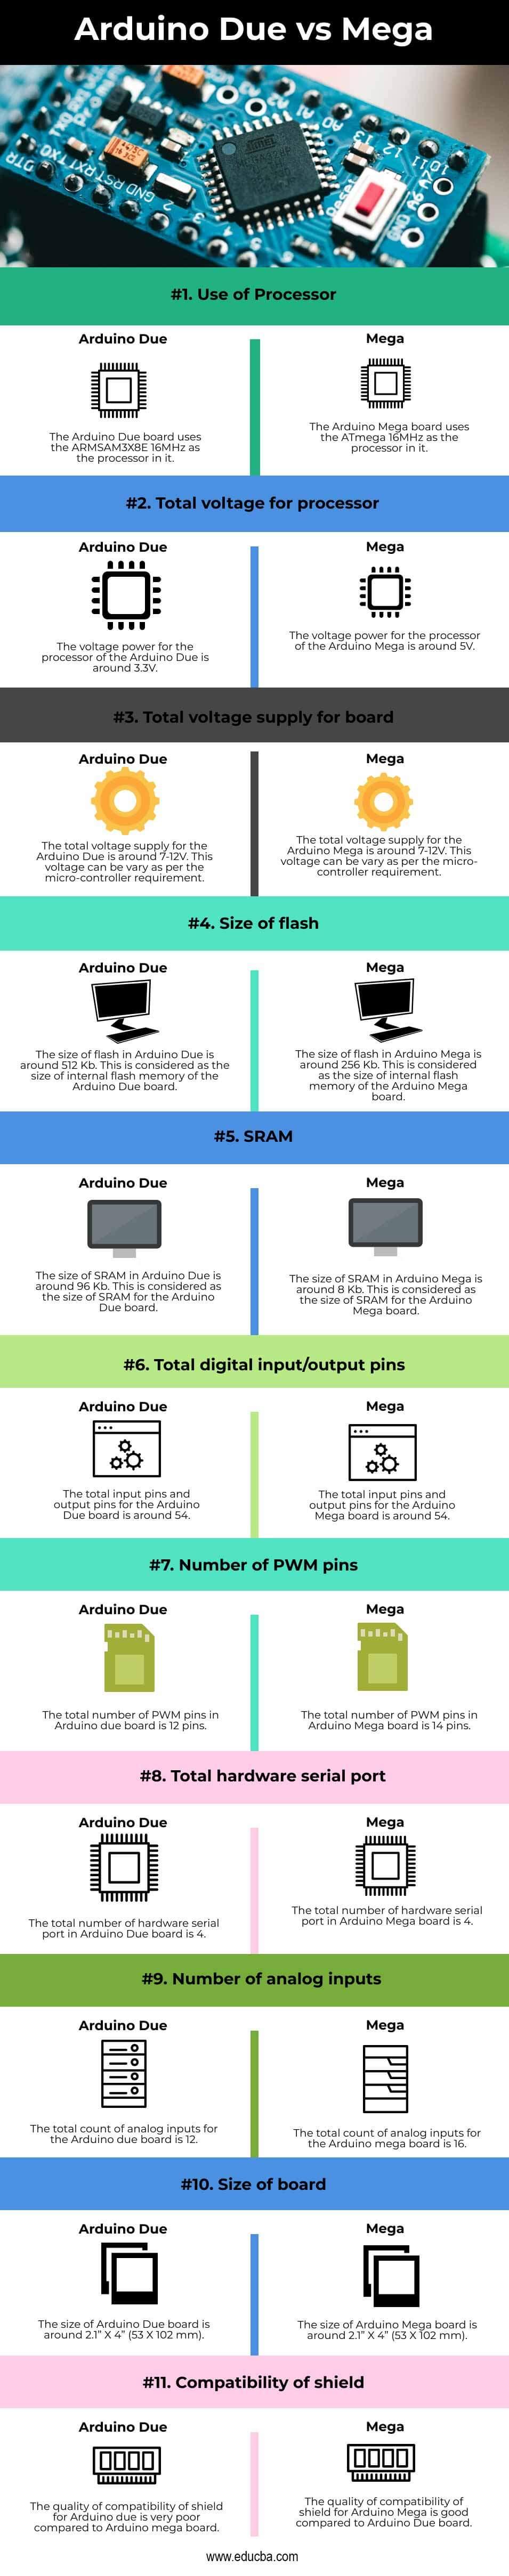 Arduino-Due-vs-Mega-info